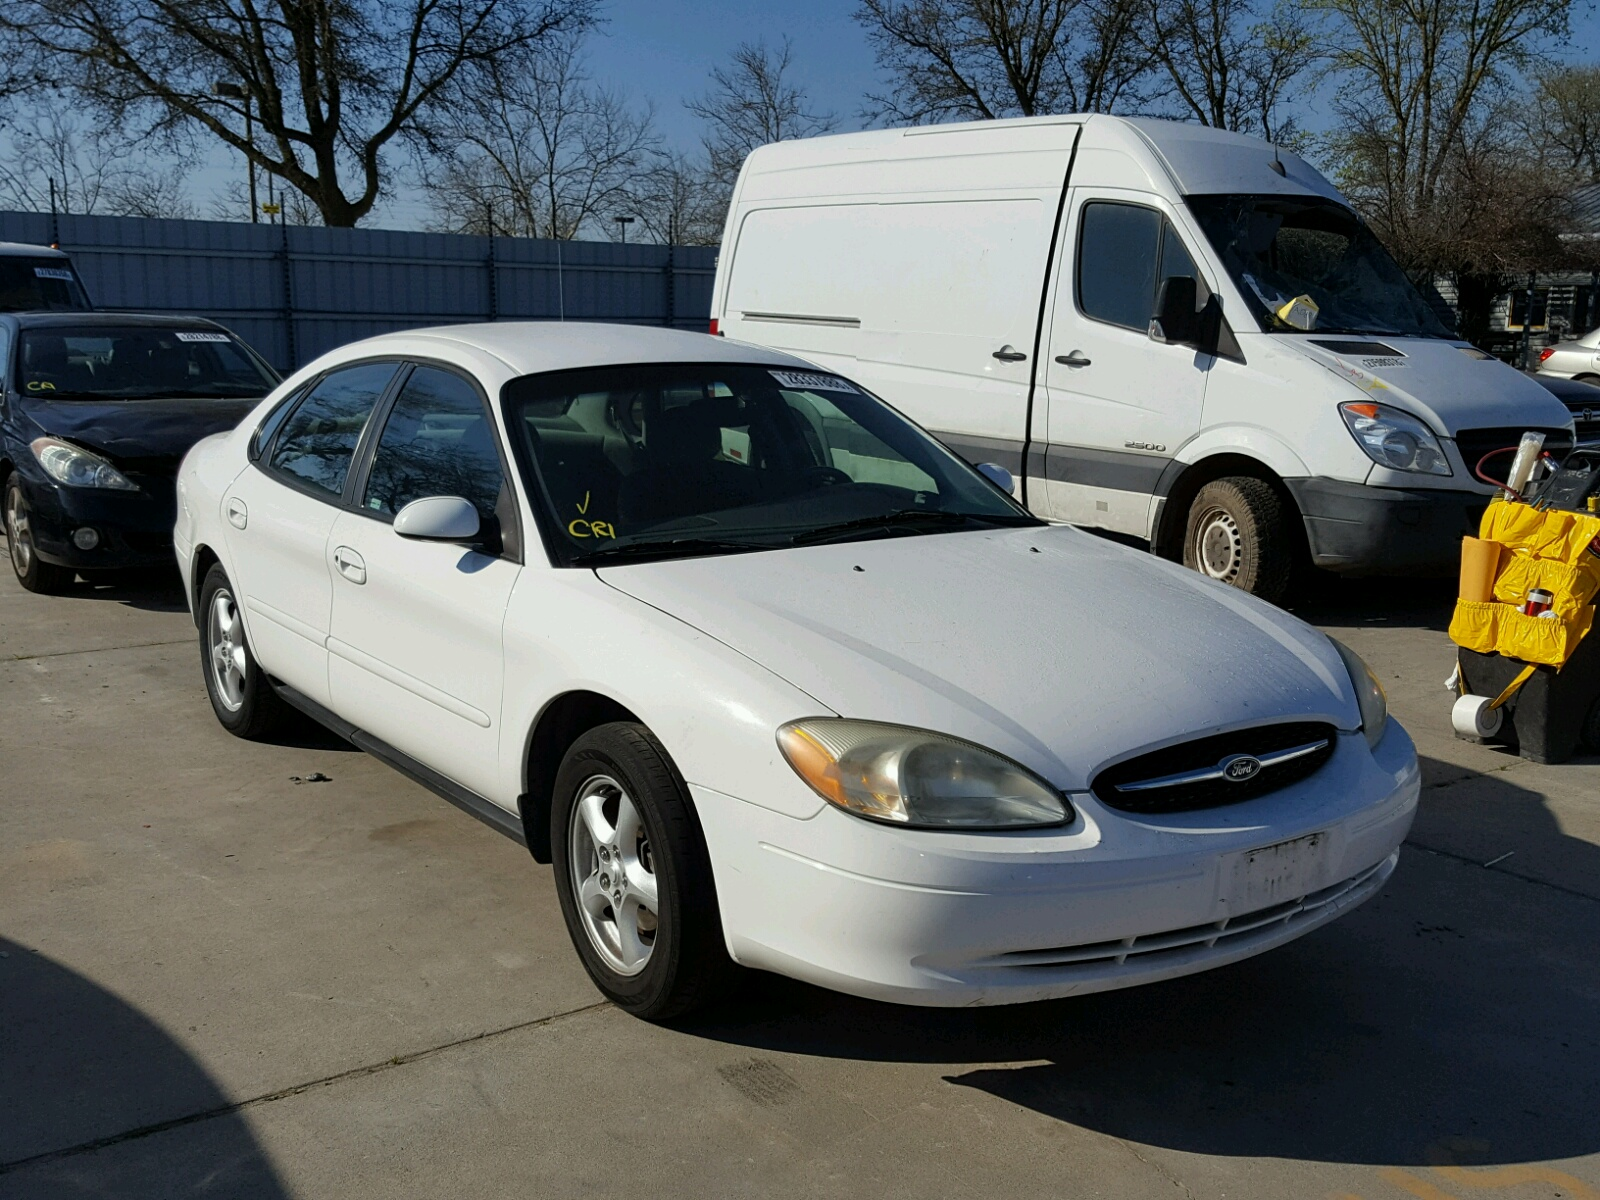 1fafp53u02g205173 2002 Ford Taurus Se 3 0l Left View